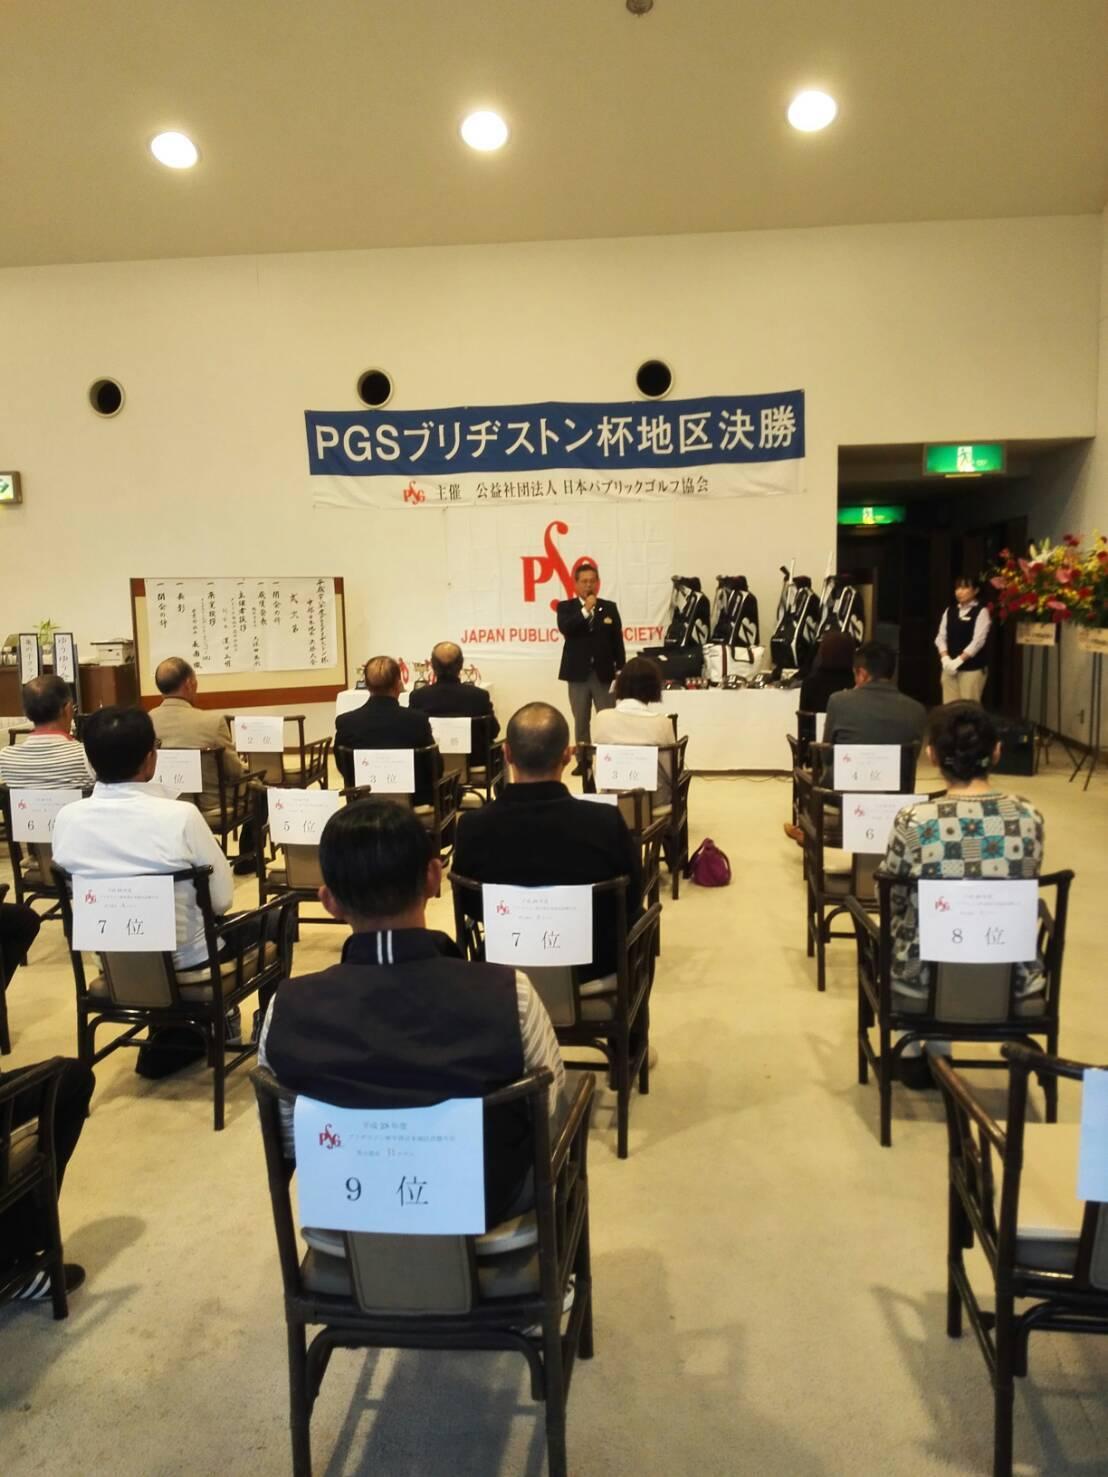 PGSブリヂストン杯 中部日本地区決勝大会結果_d0338682_15383549.jpg